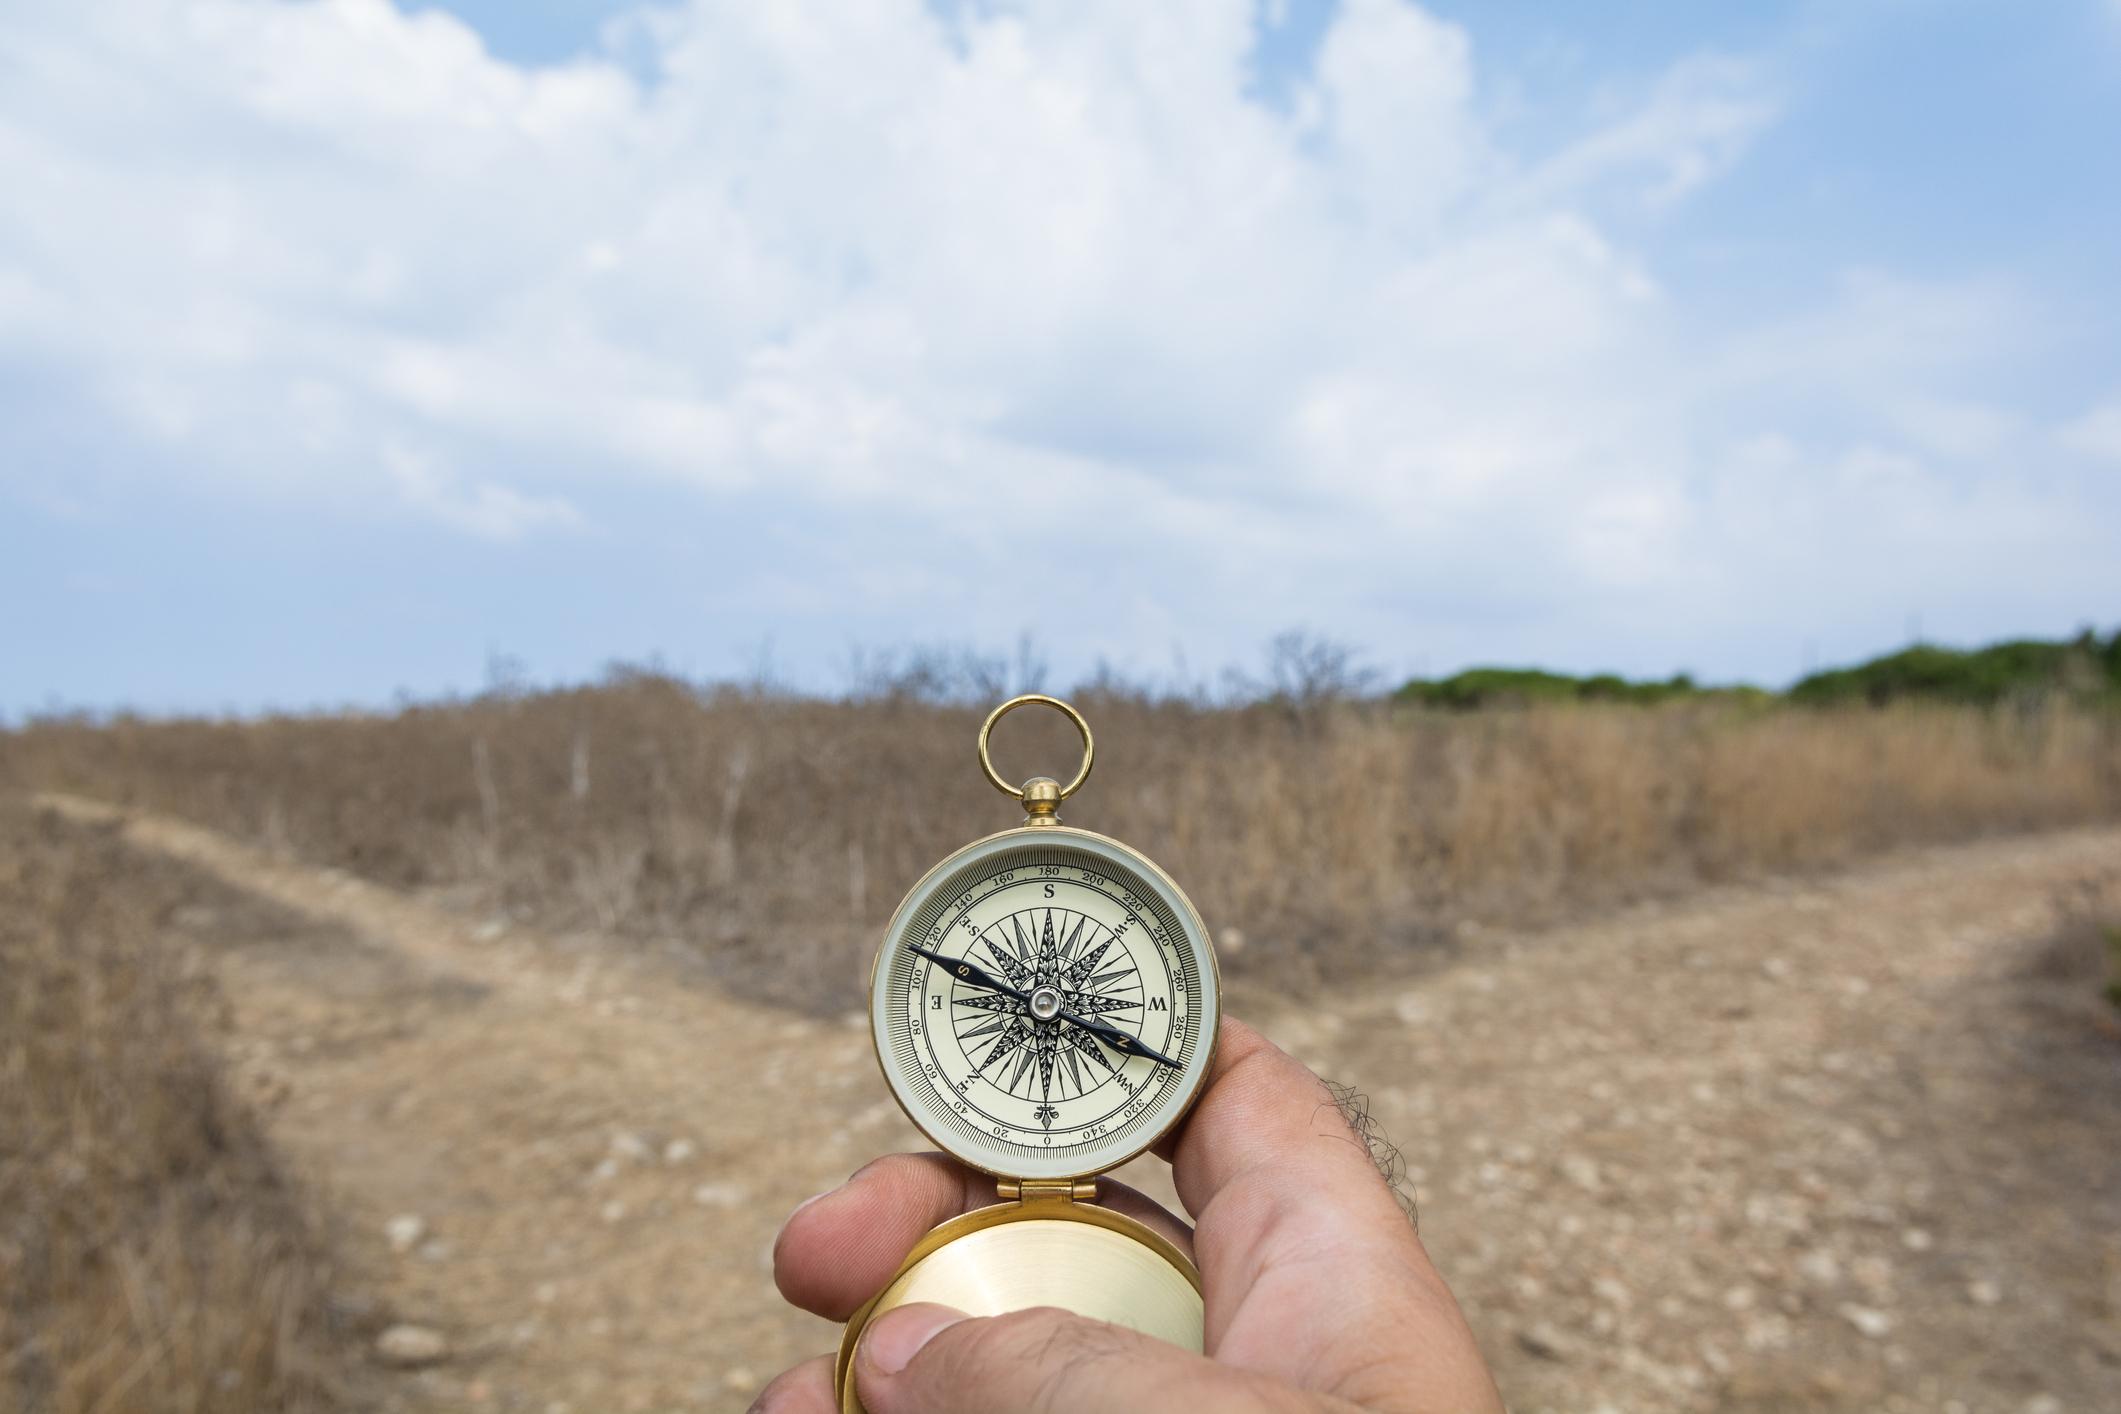 Coaching Webinar - Ethical Decision Making